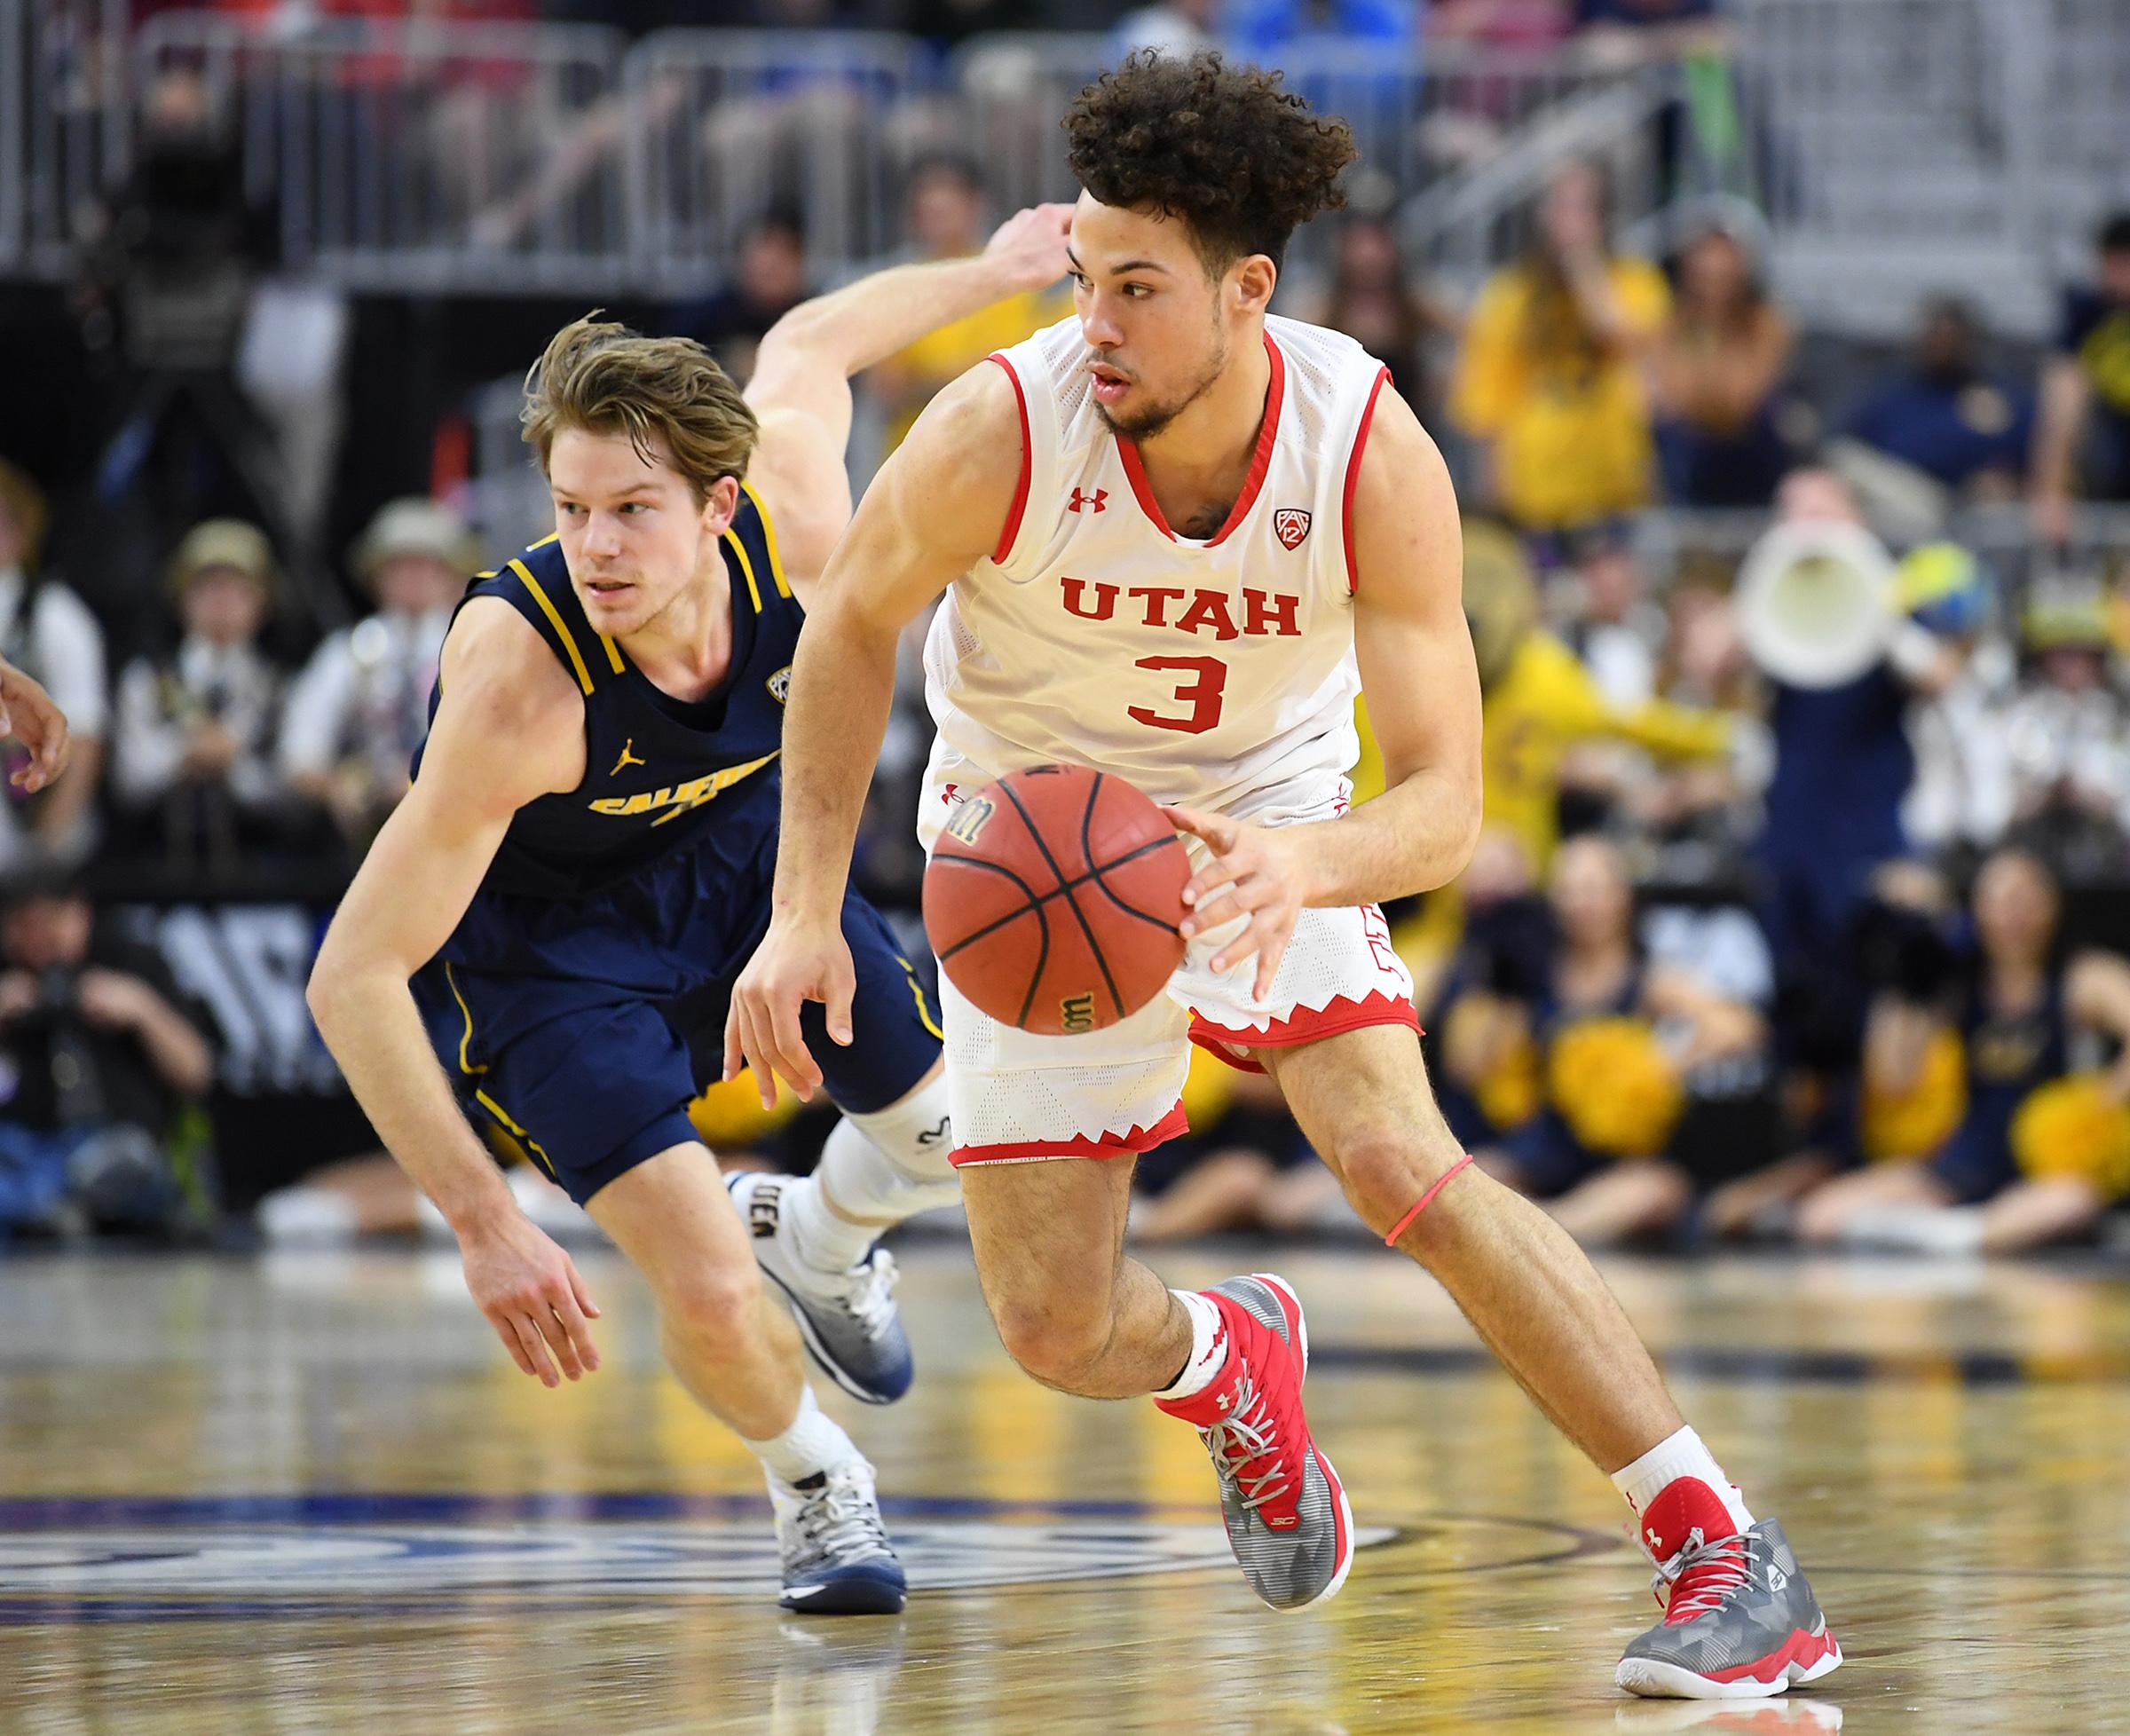 9928573-ncaa-basketball-pac-12-conference-tournament-california-vs-utah